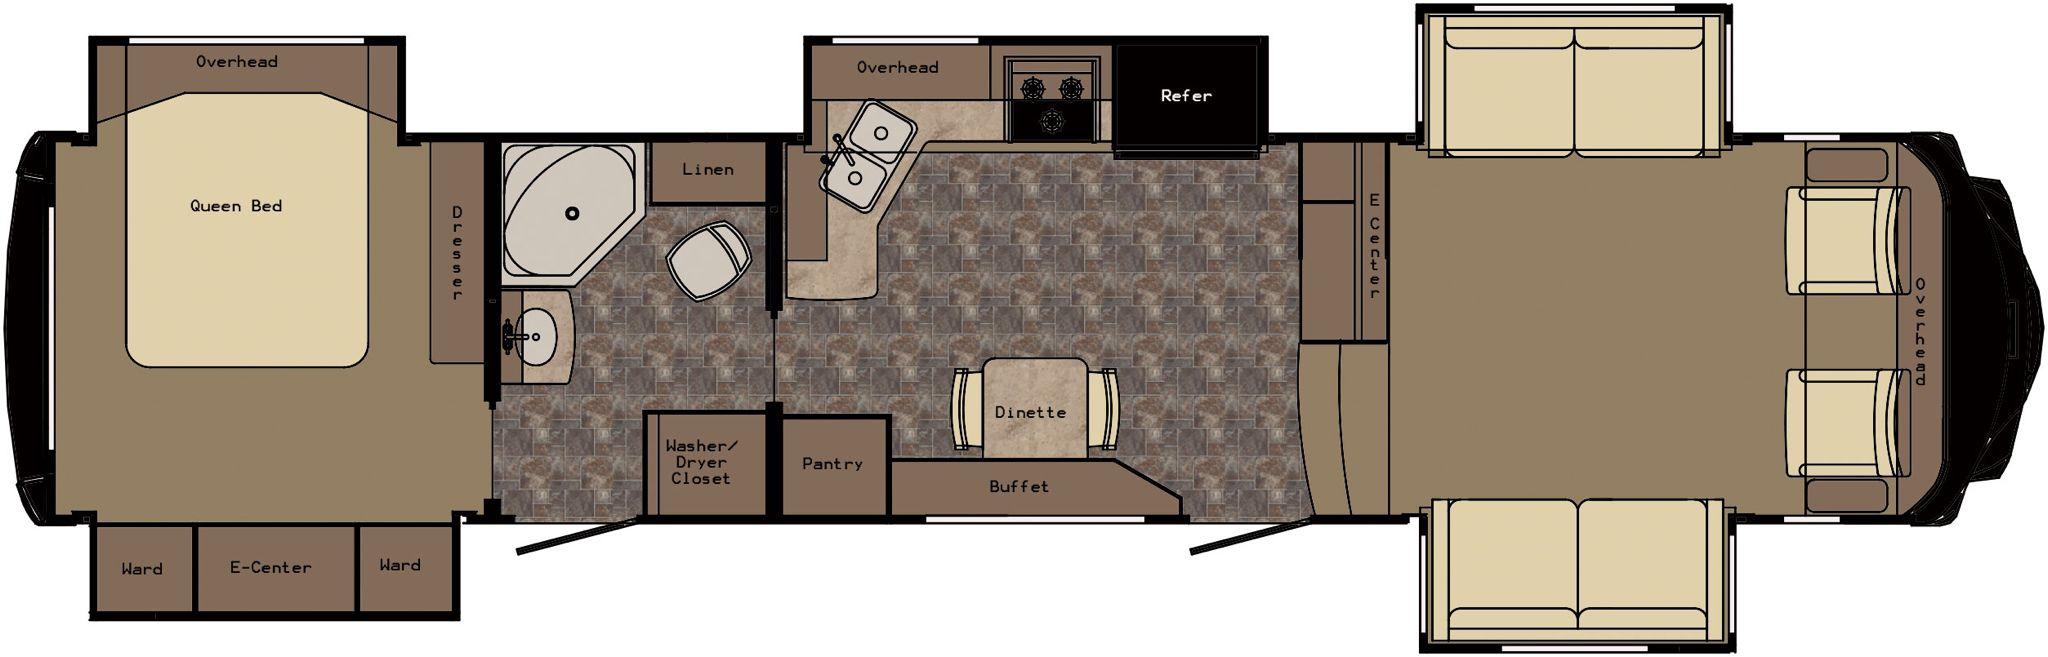 Future RV layout Rv floor plans, Floor plans, Camper